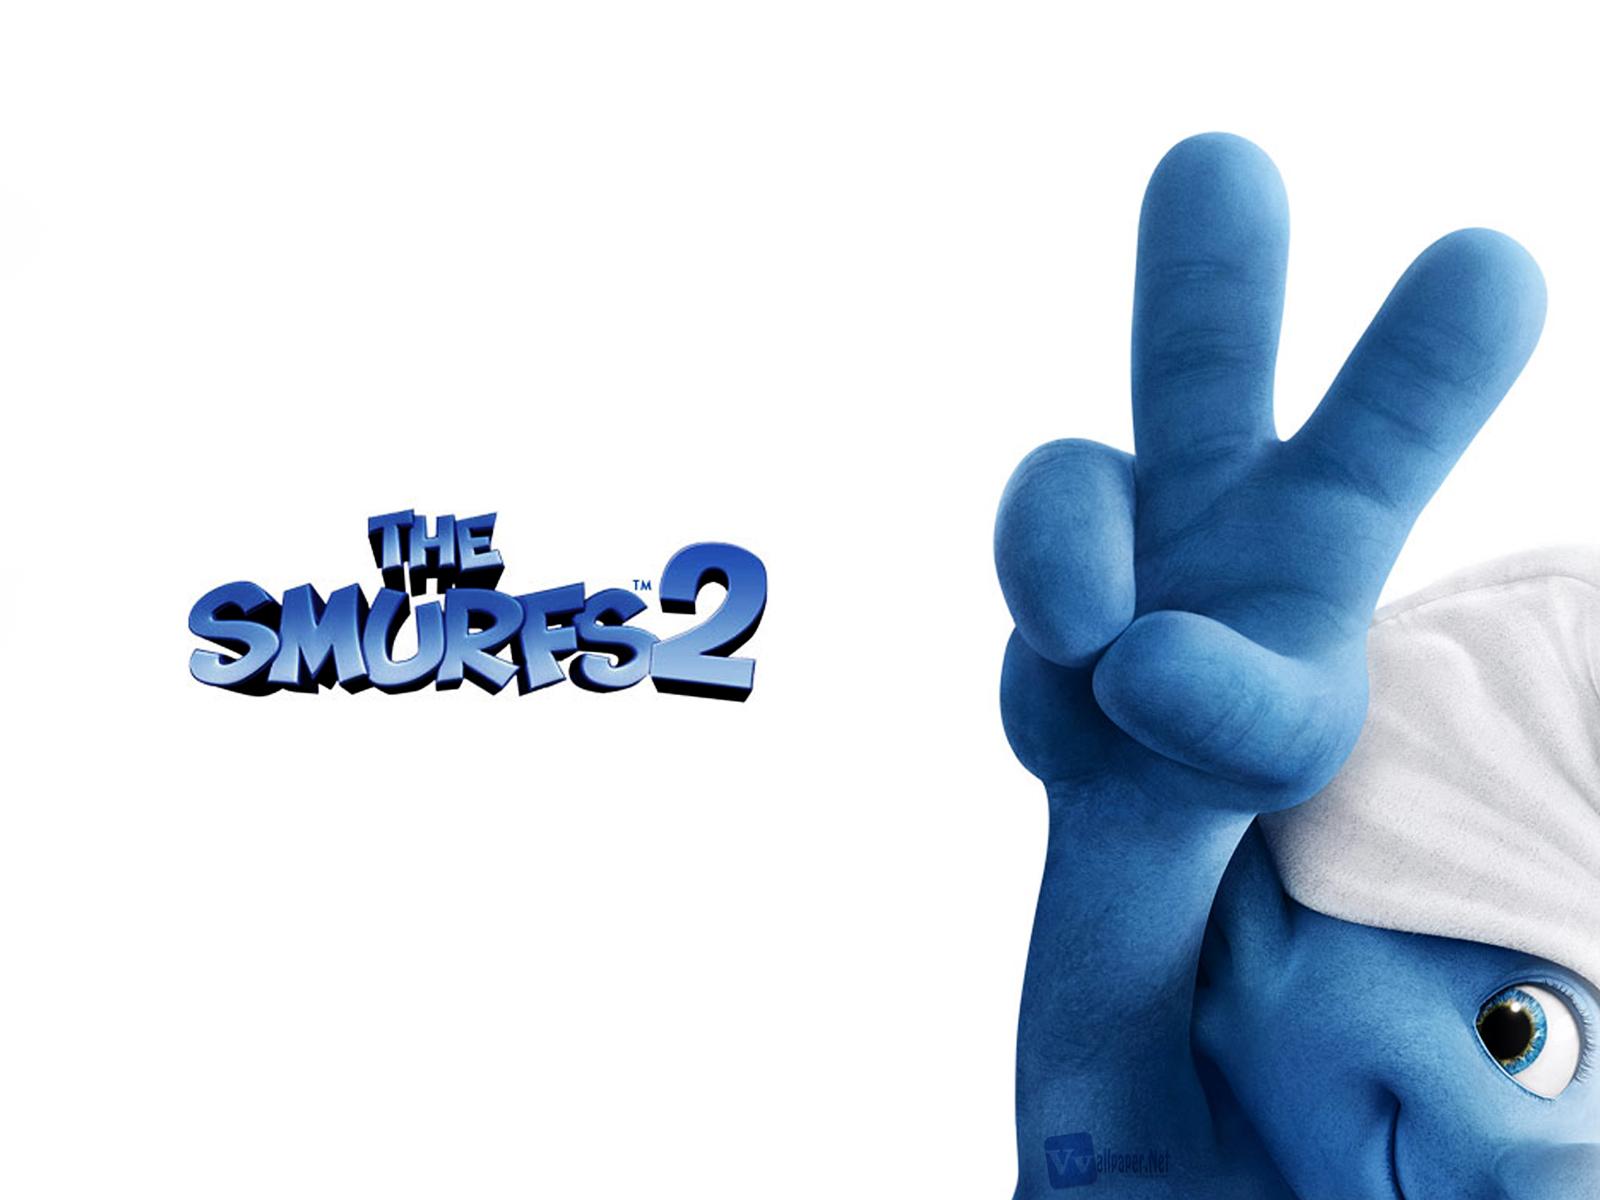 The-Smurfs-2-Movie-HD-wallpaper.jpg